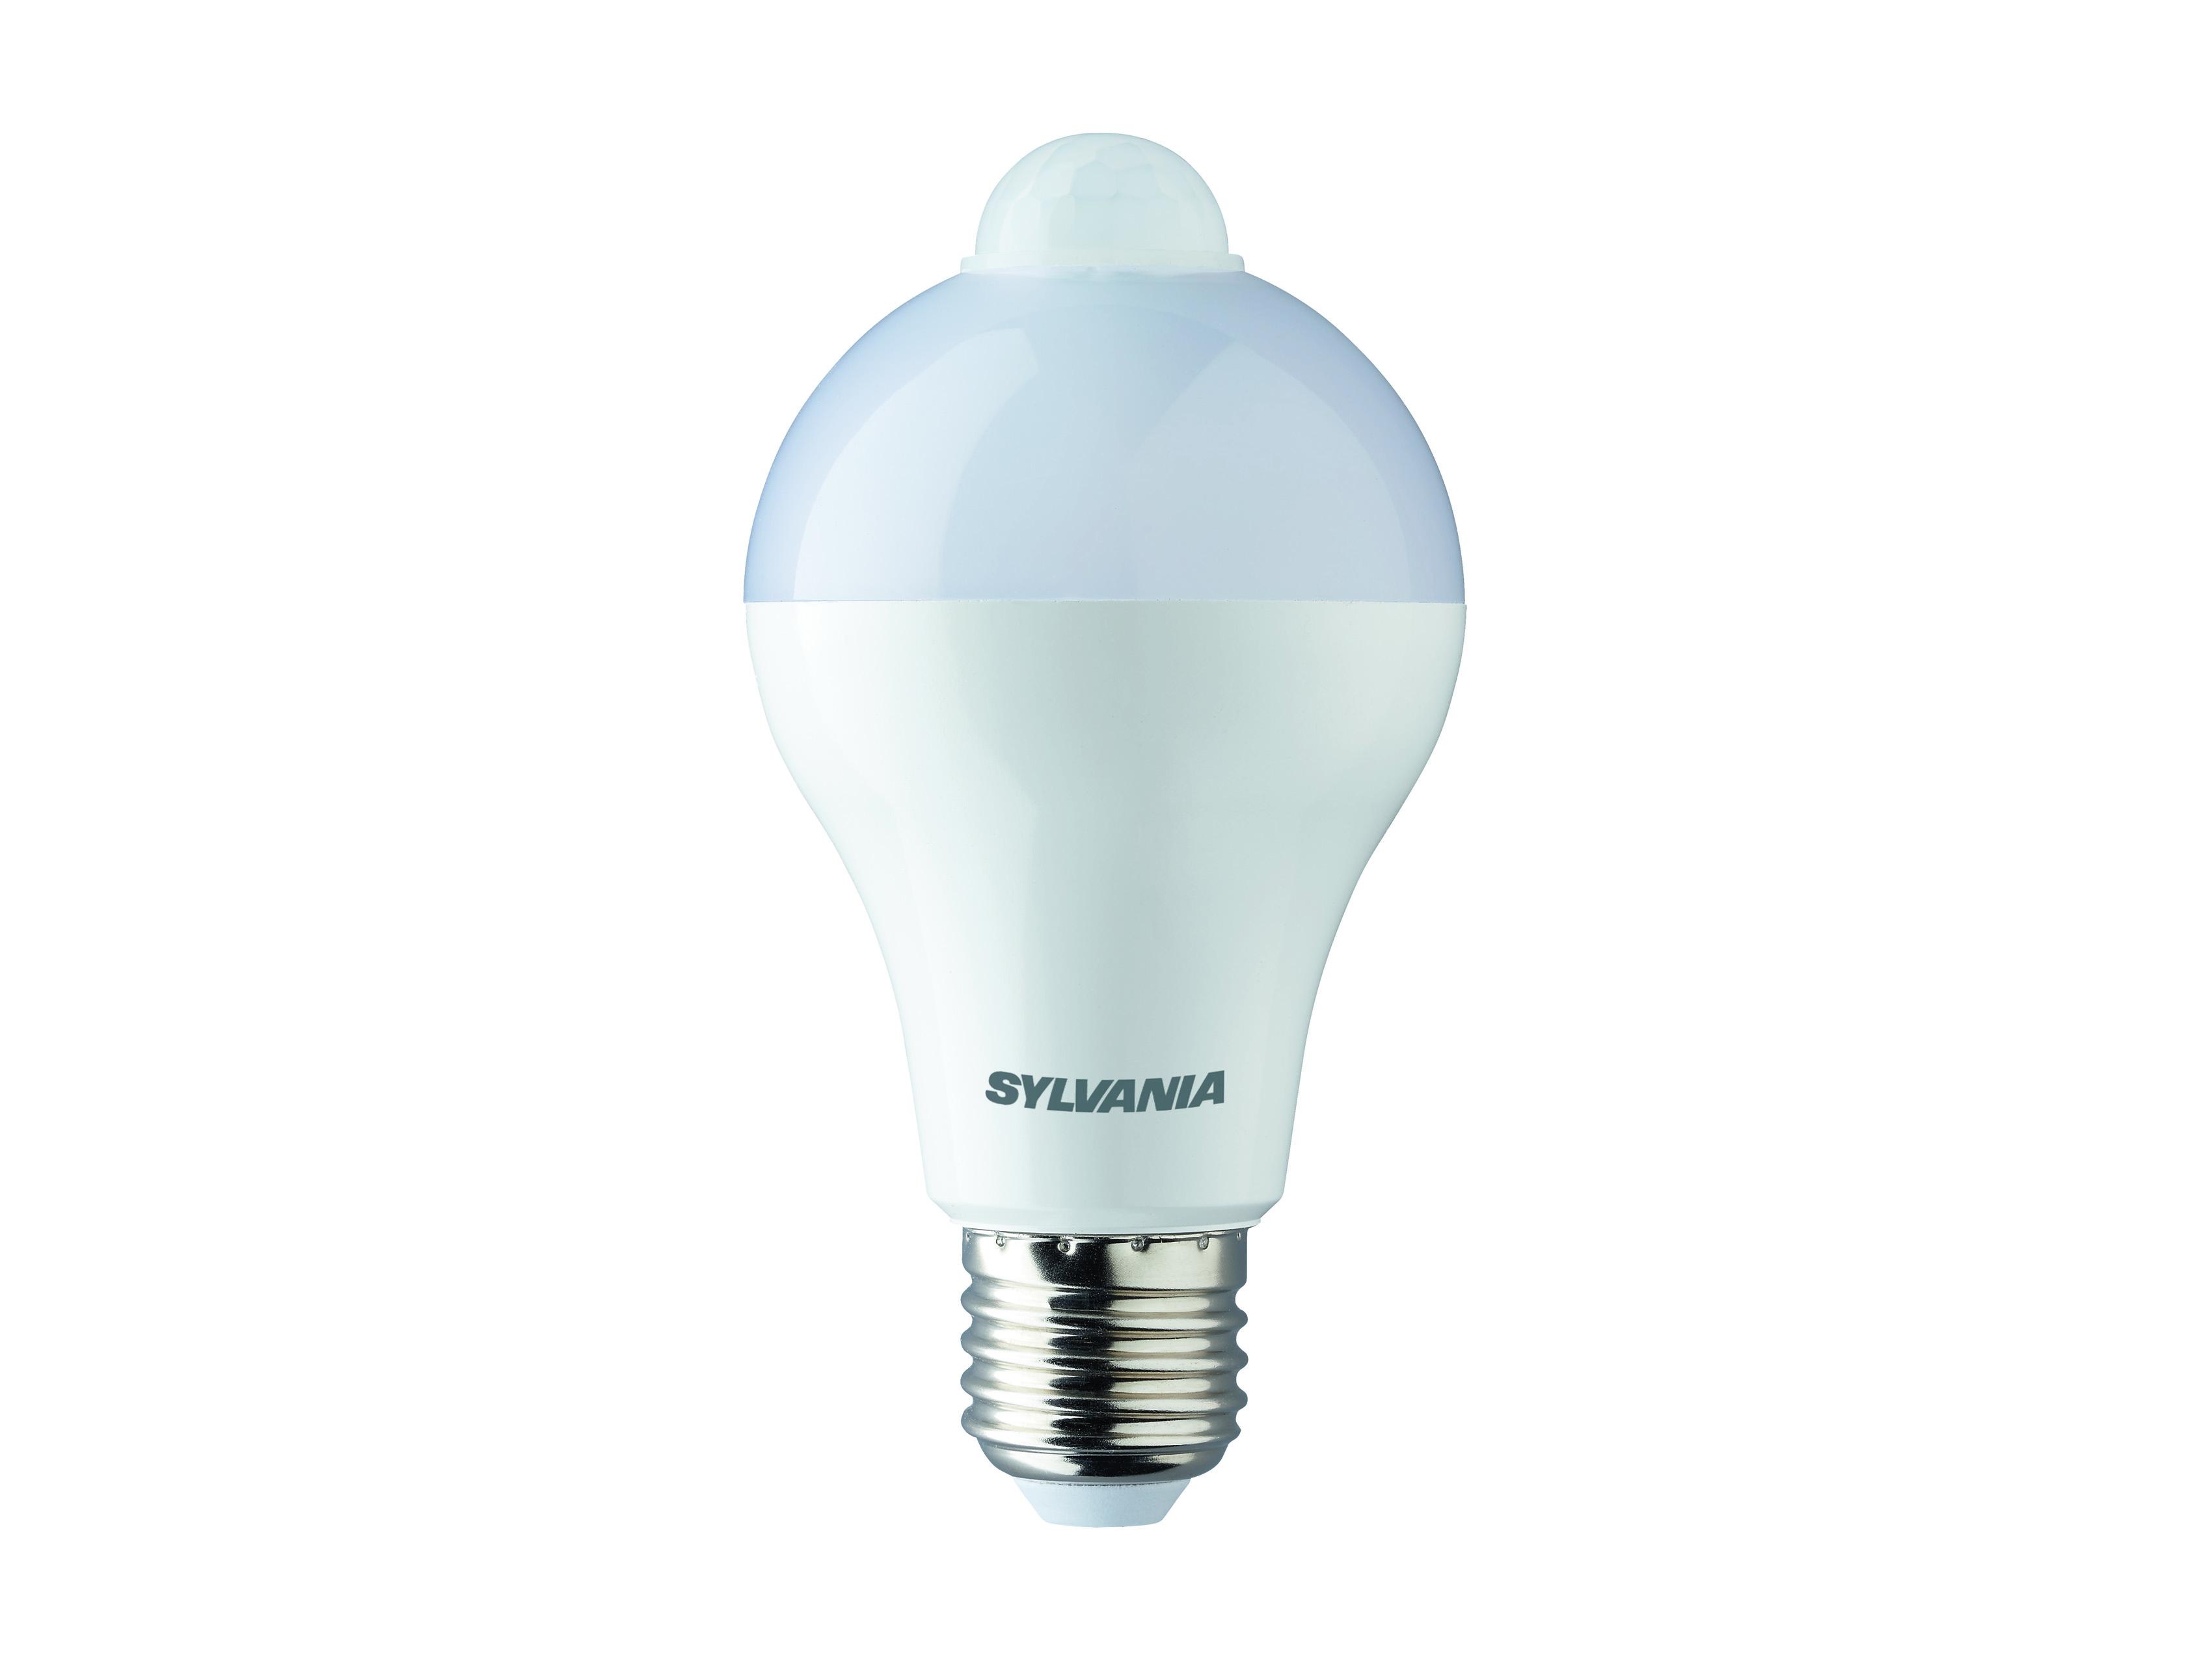 Sylvania LED-Lampe Leuchtmittel R7S 8W 1055 lm 2700 K